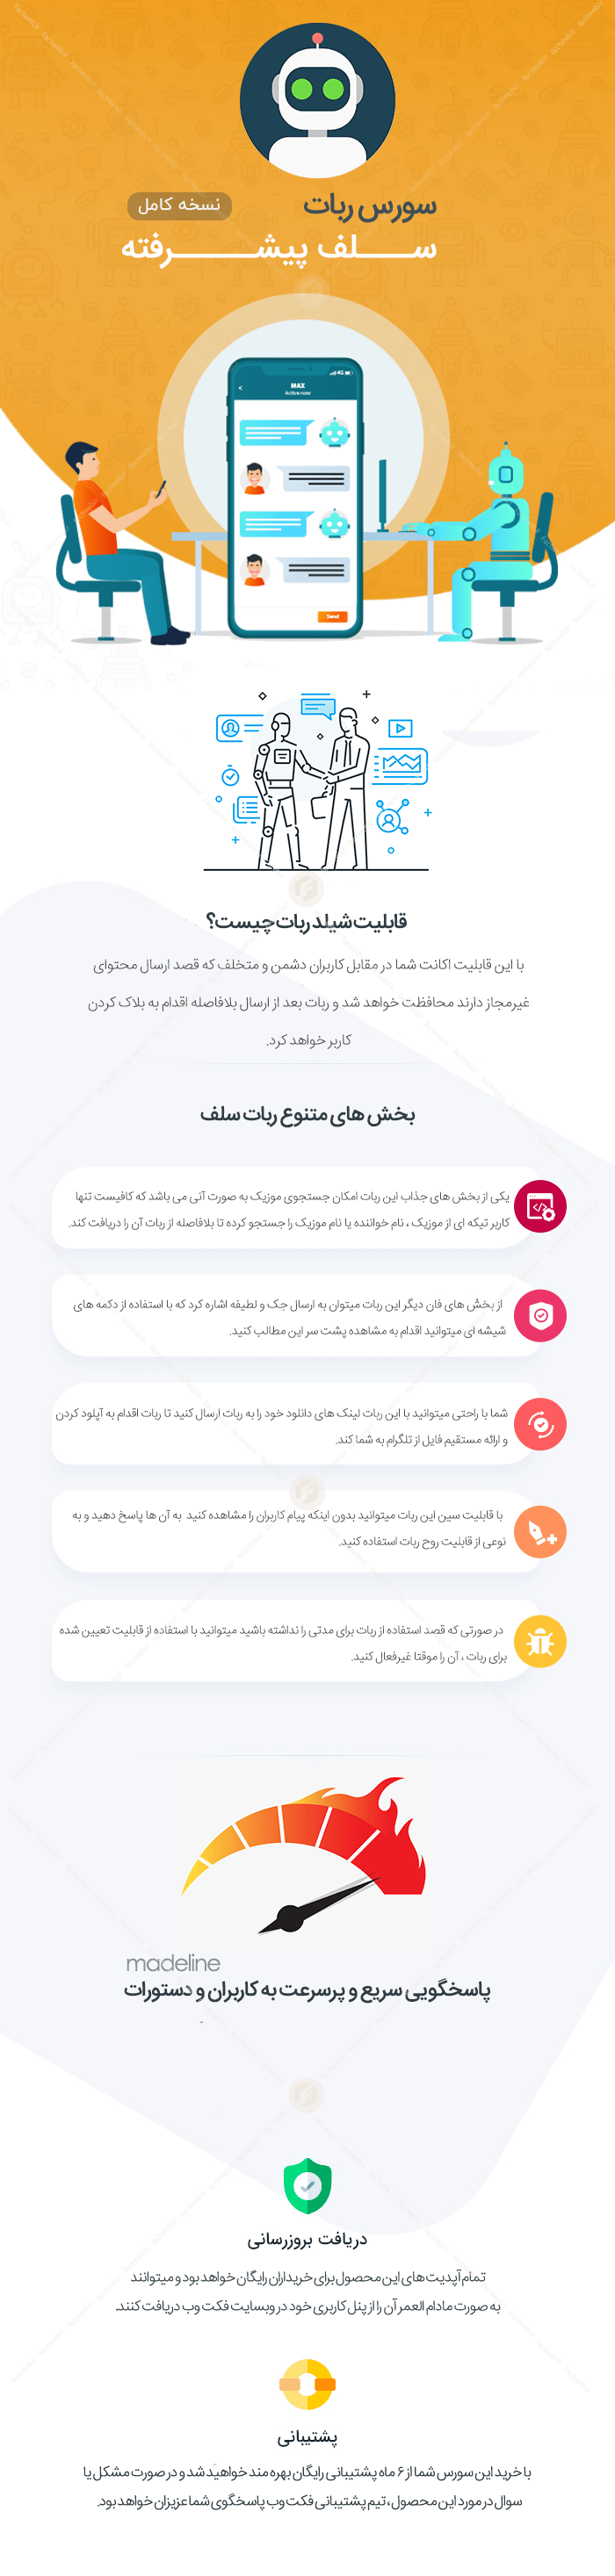 سورس ربات سلف پیشرفته (نسخه کامل)